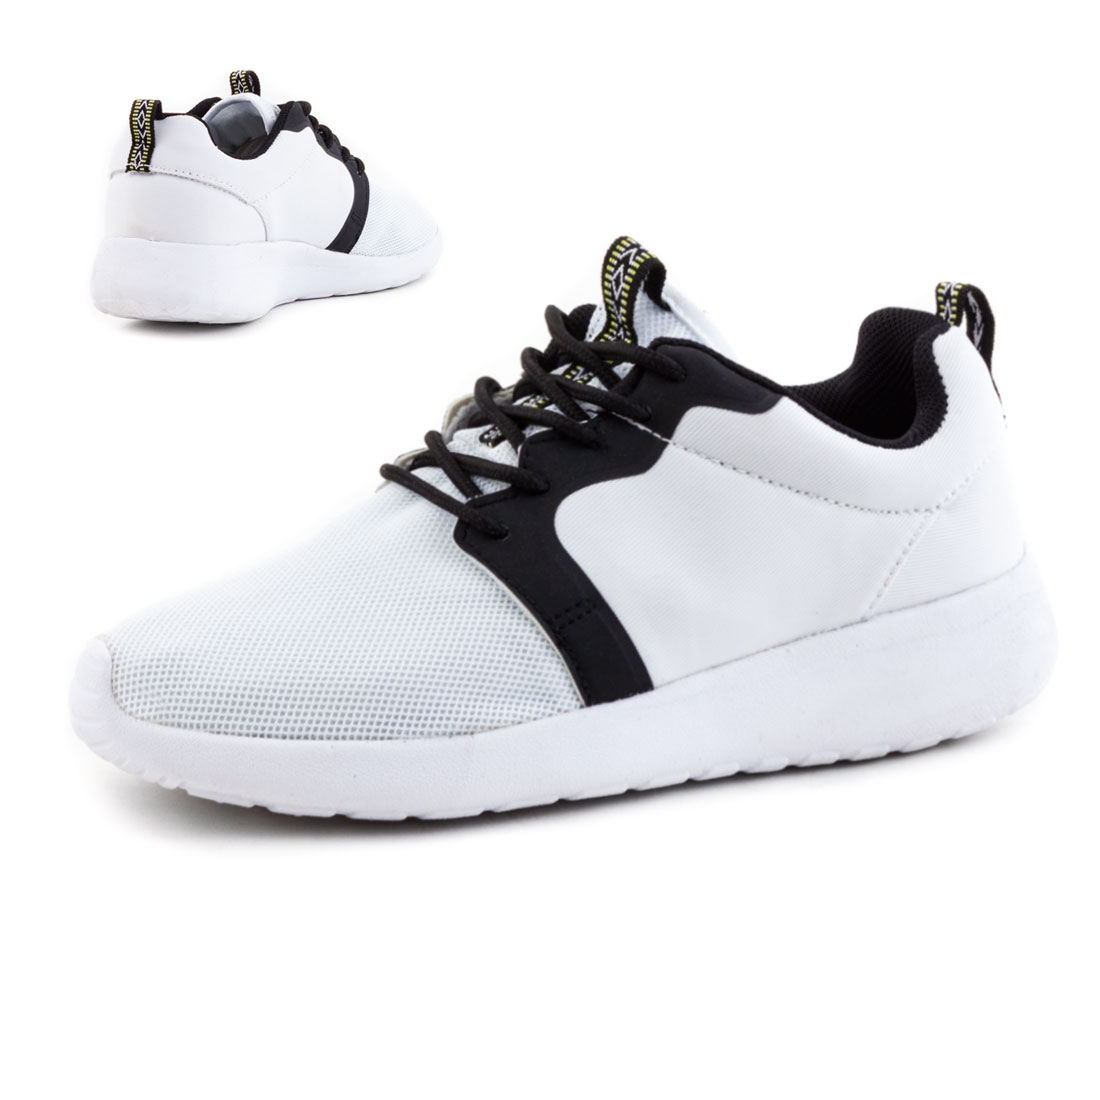 neu unisex damen herren sport sneaker wei e sohle schuhe. Black Bedroom Furniture Sets. Home Design Ideas